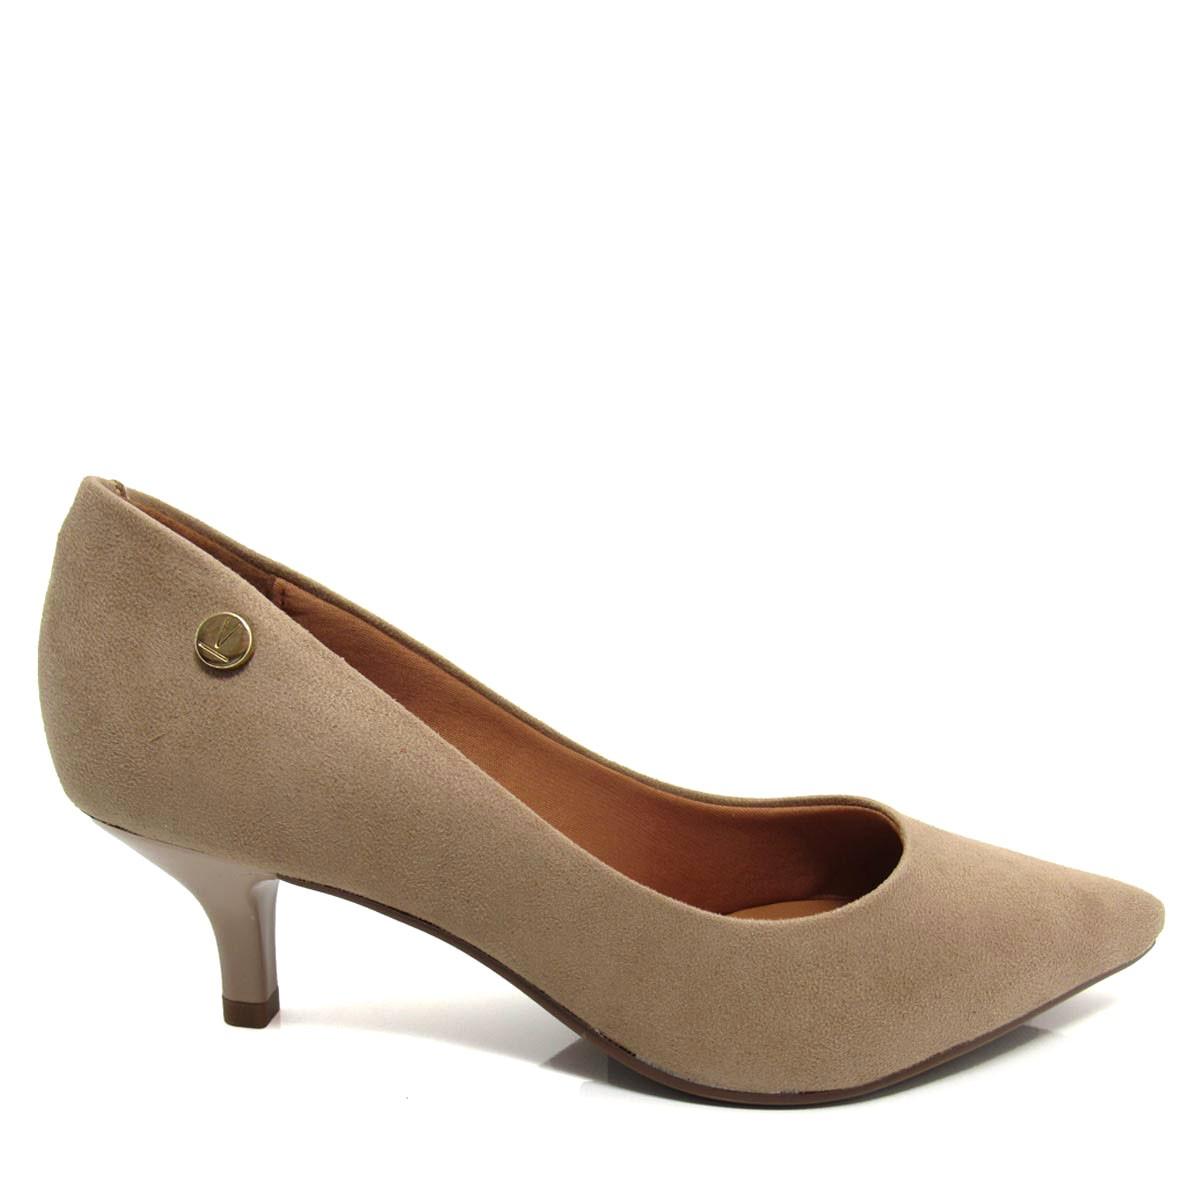 3b18ac697 Sapato Scarpin Feminino Vizzano 1122628 Salto Fino Baixo Coleção 2018